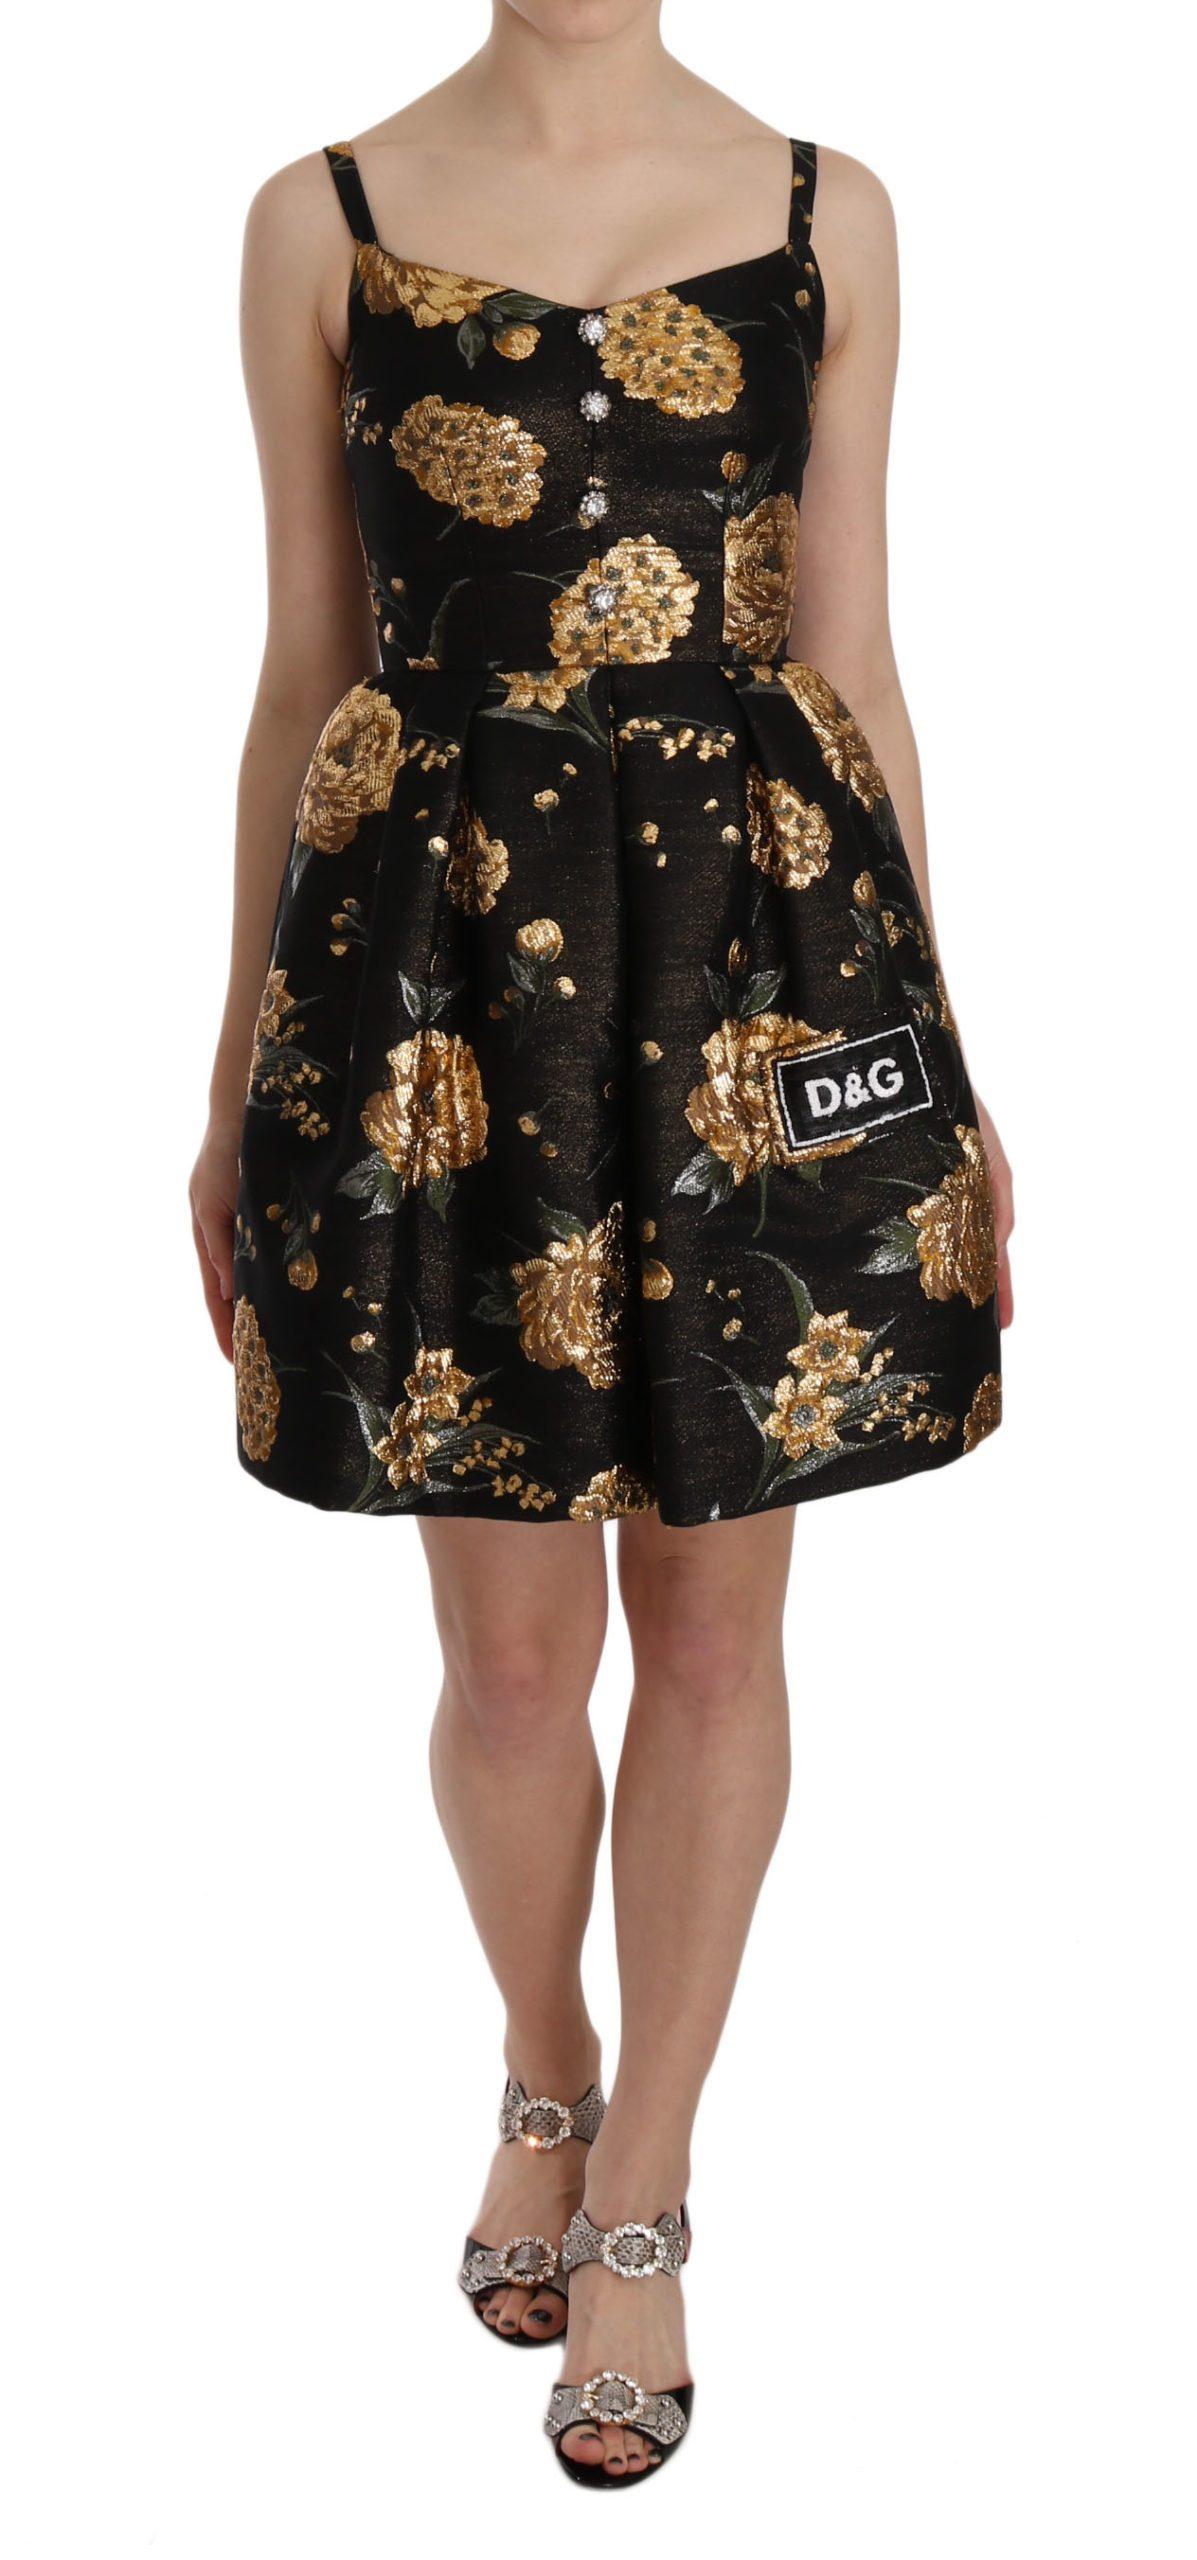 Dolce & Gabbana Women's Metallic Jacquard Crystal Dress Black DR1636 - IT40|S